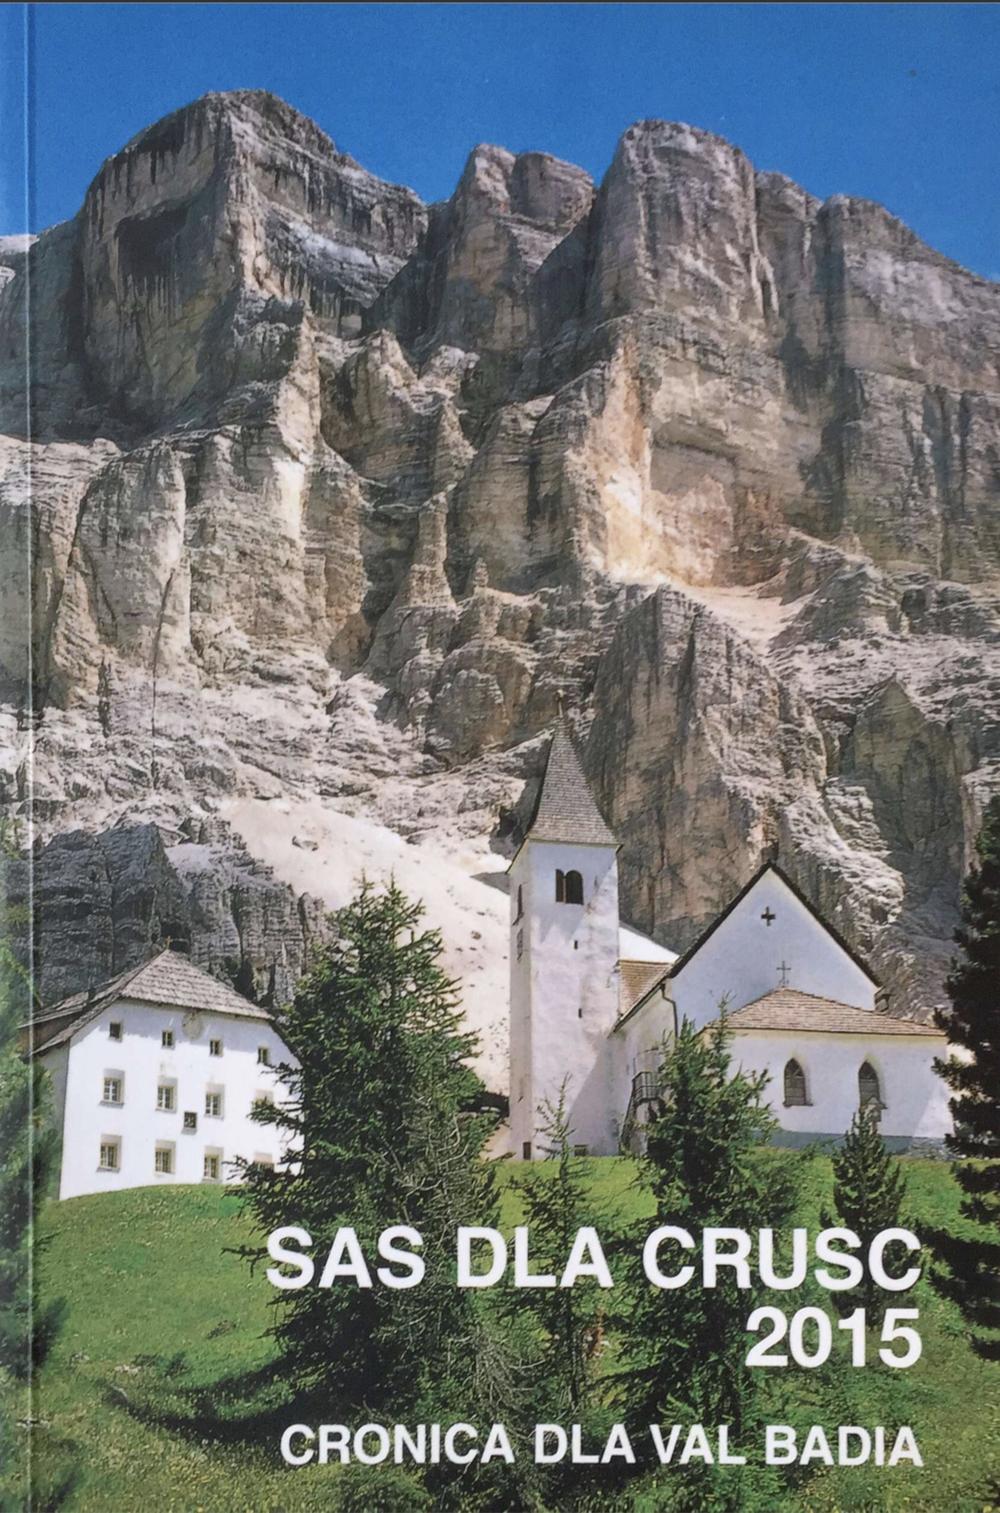 sas-dla-crusc-2015